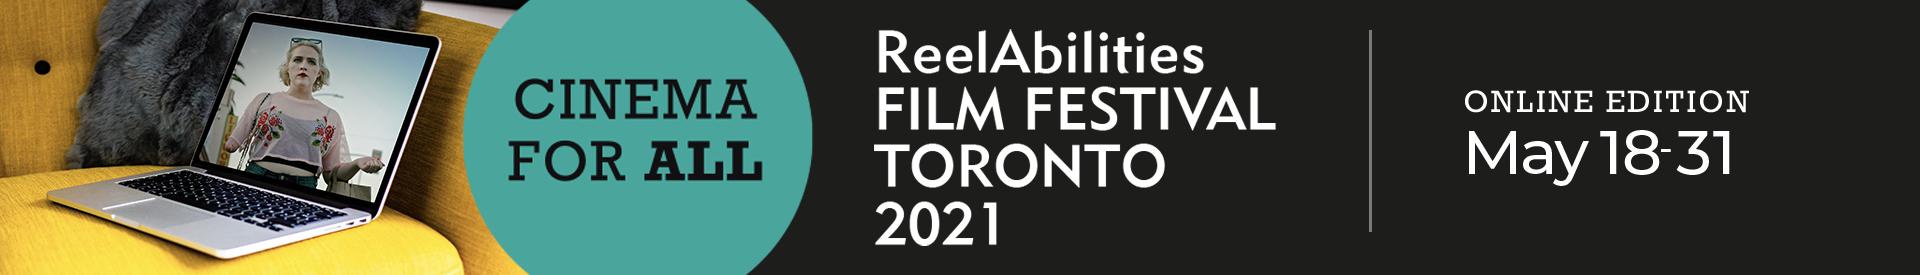 ReelAbilities Film Festival Toronto